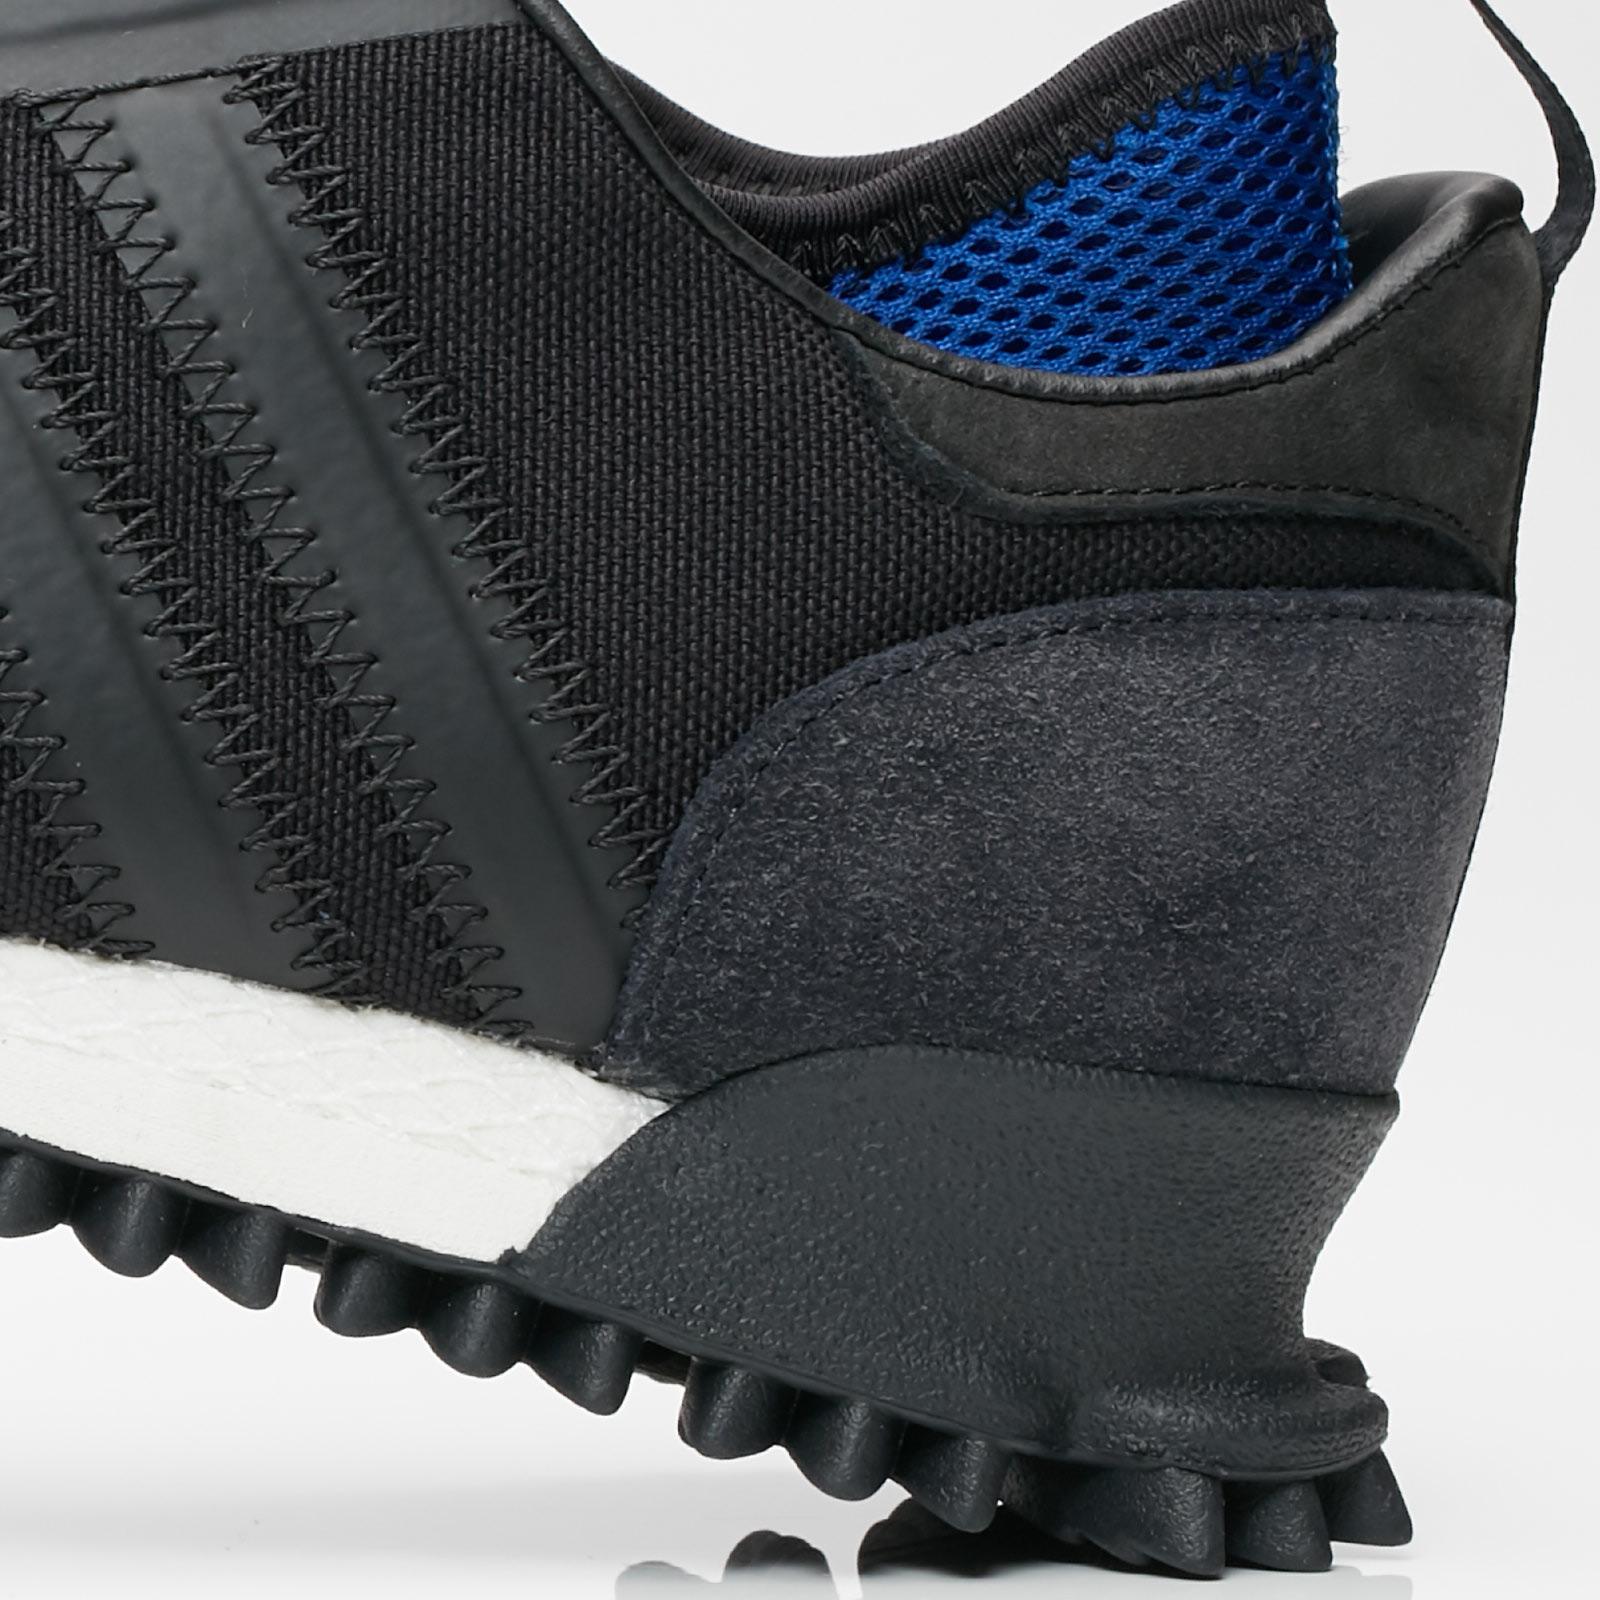 new product d0b08 bca95 adidas Marathon x C.P. Company - 6. Close